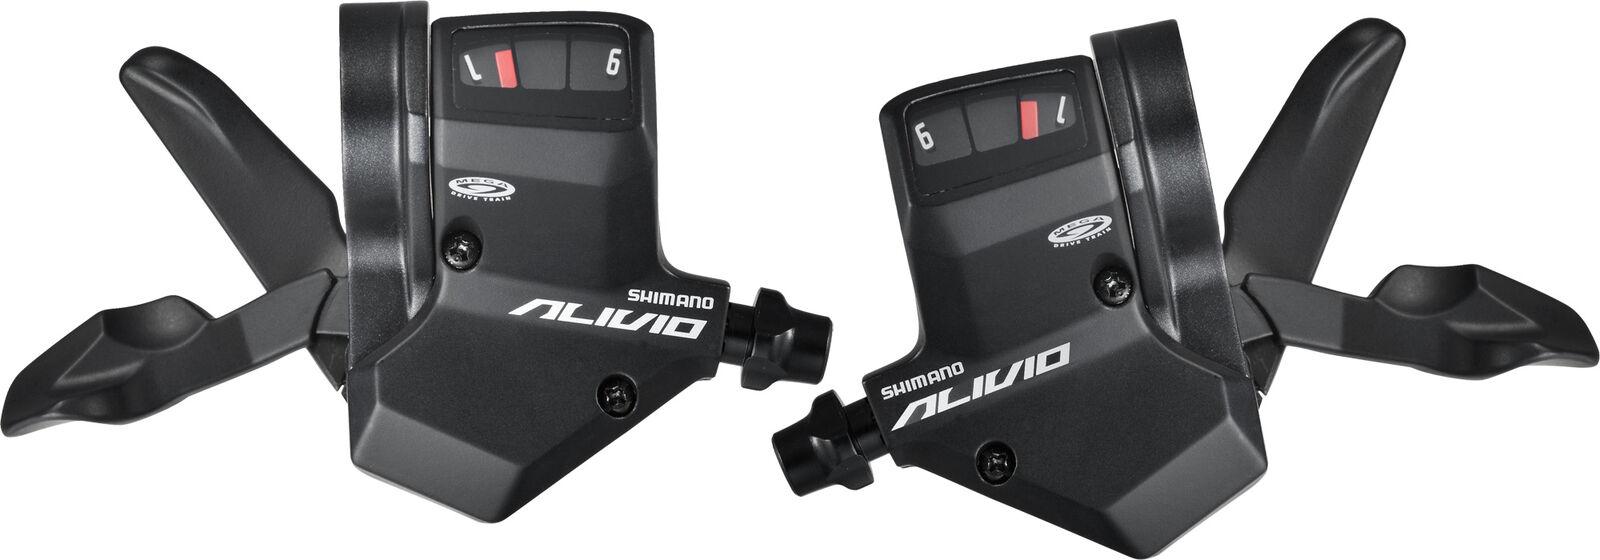 Shimano ALIVIO 3X9SPD Shifters  1pair SLM430